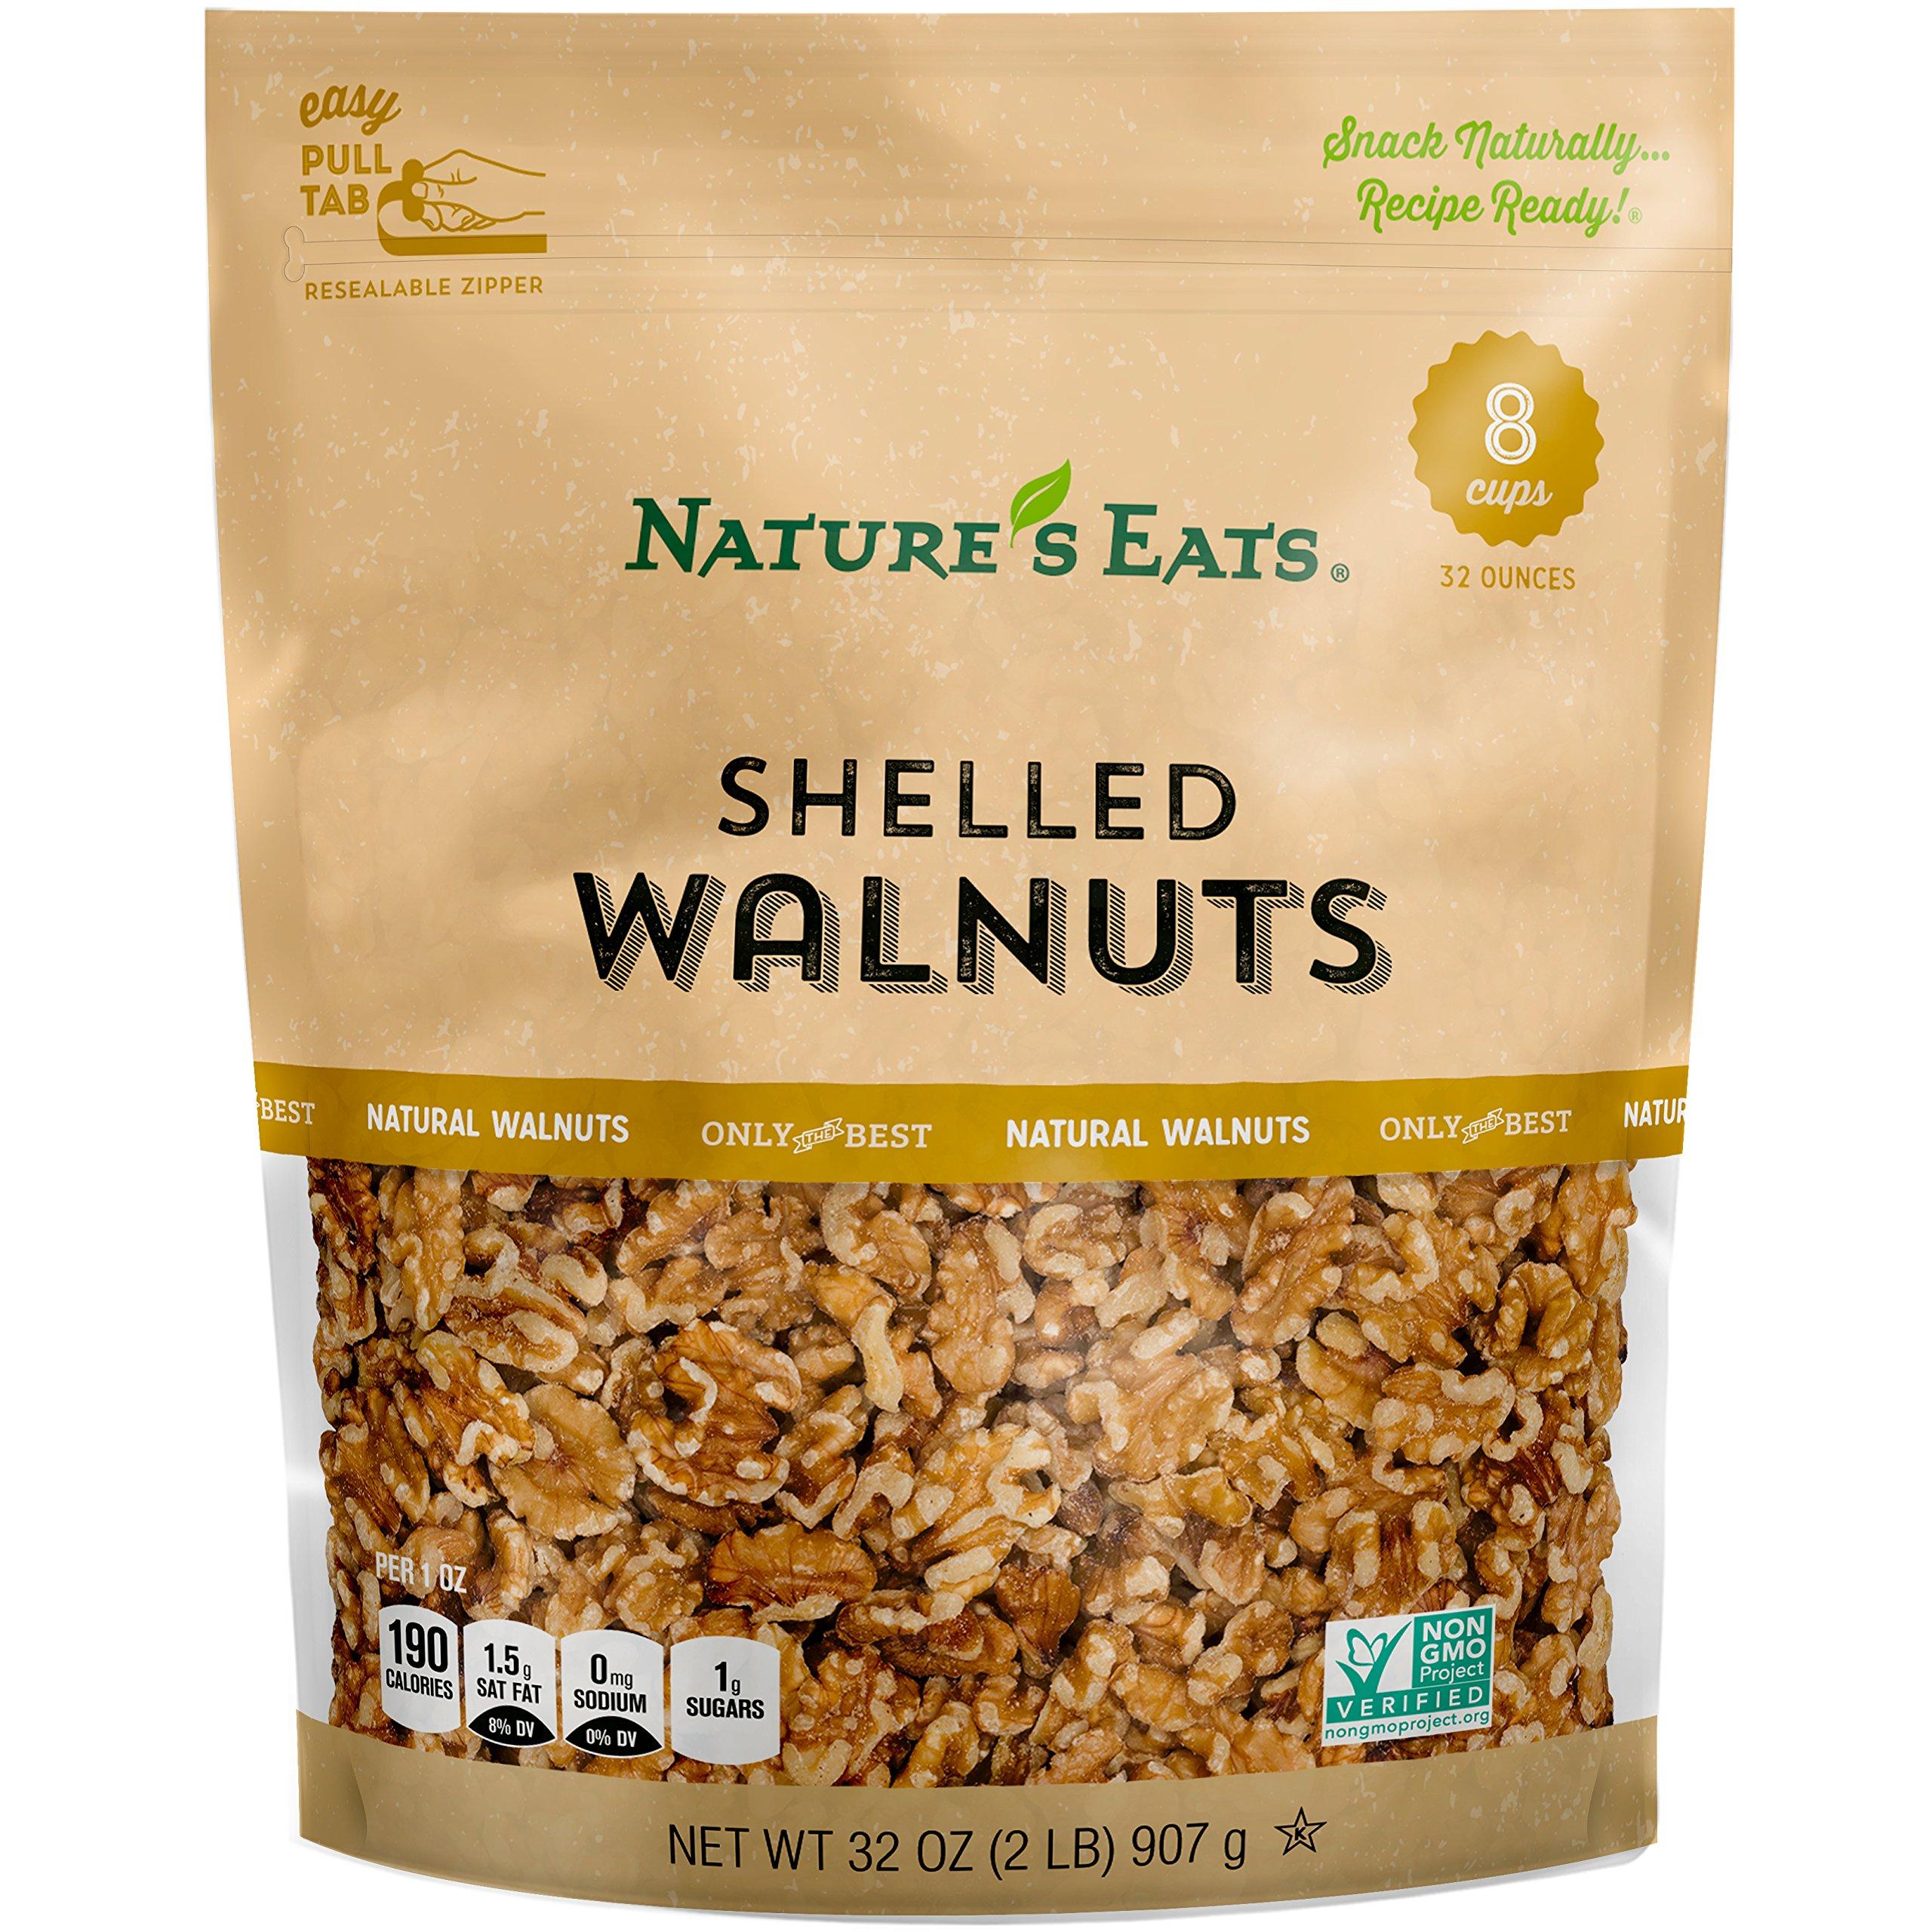 Nature's Eats Walnuts, 32 Ounce